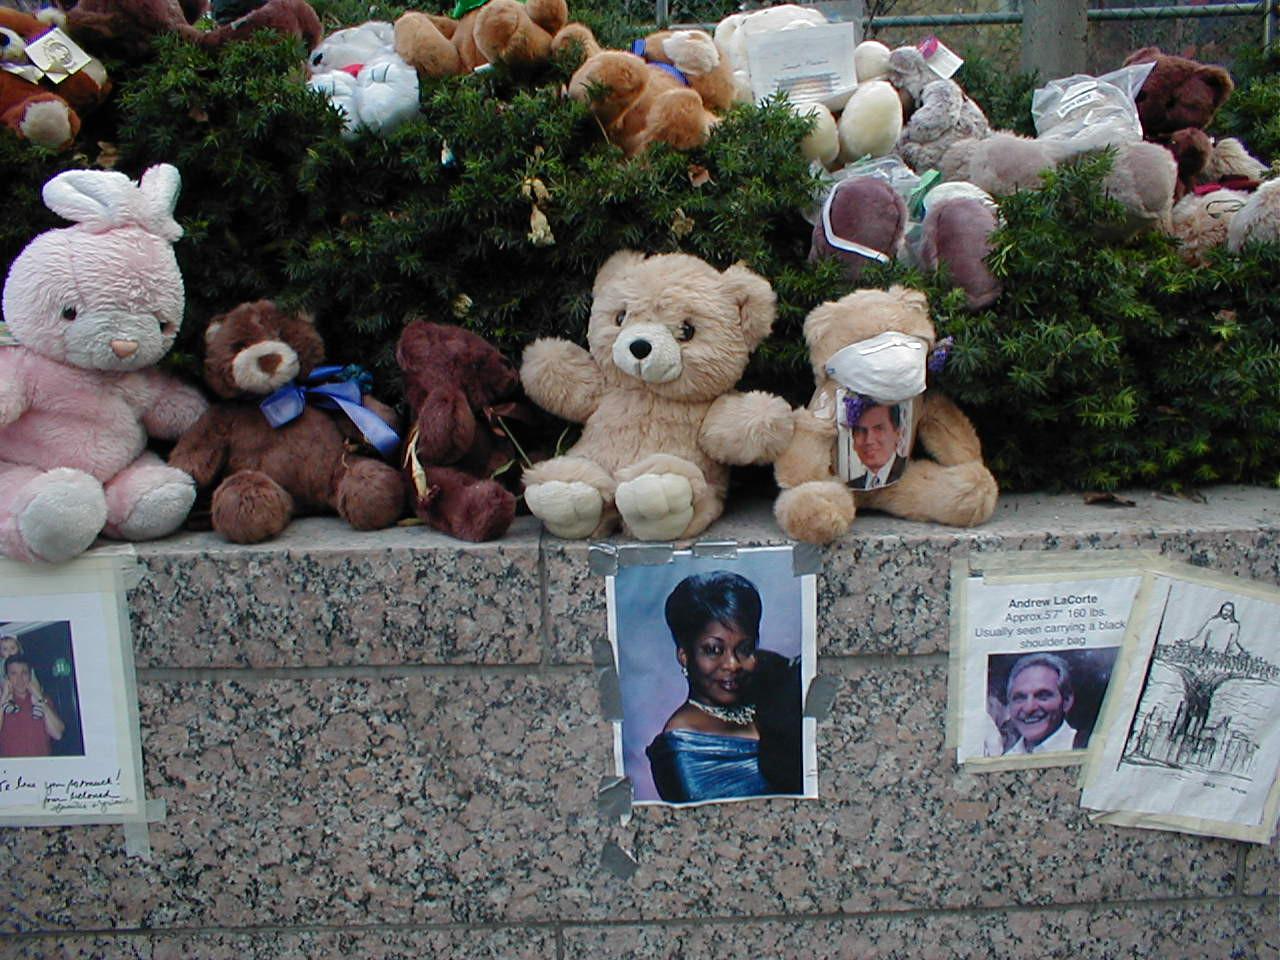 Wailing Wall of Teddy Bears (2001)